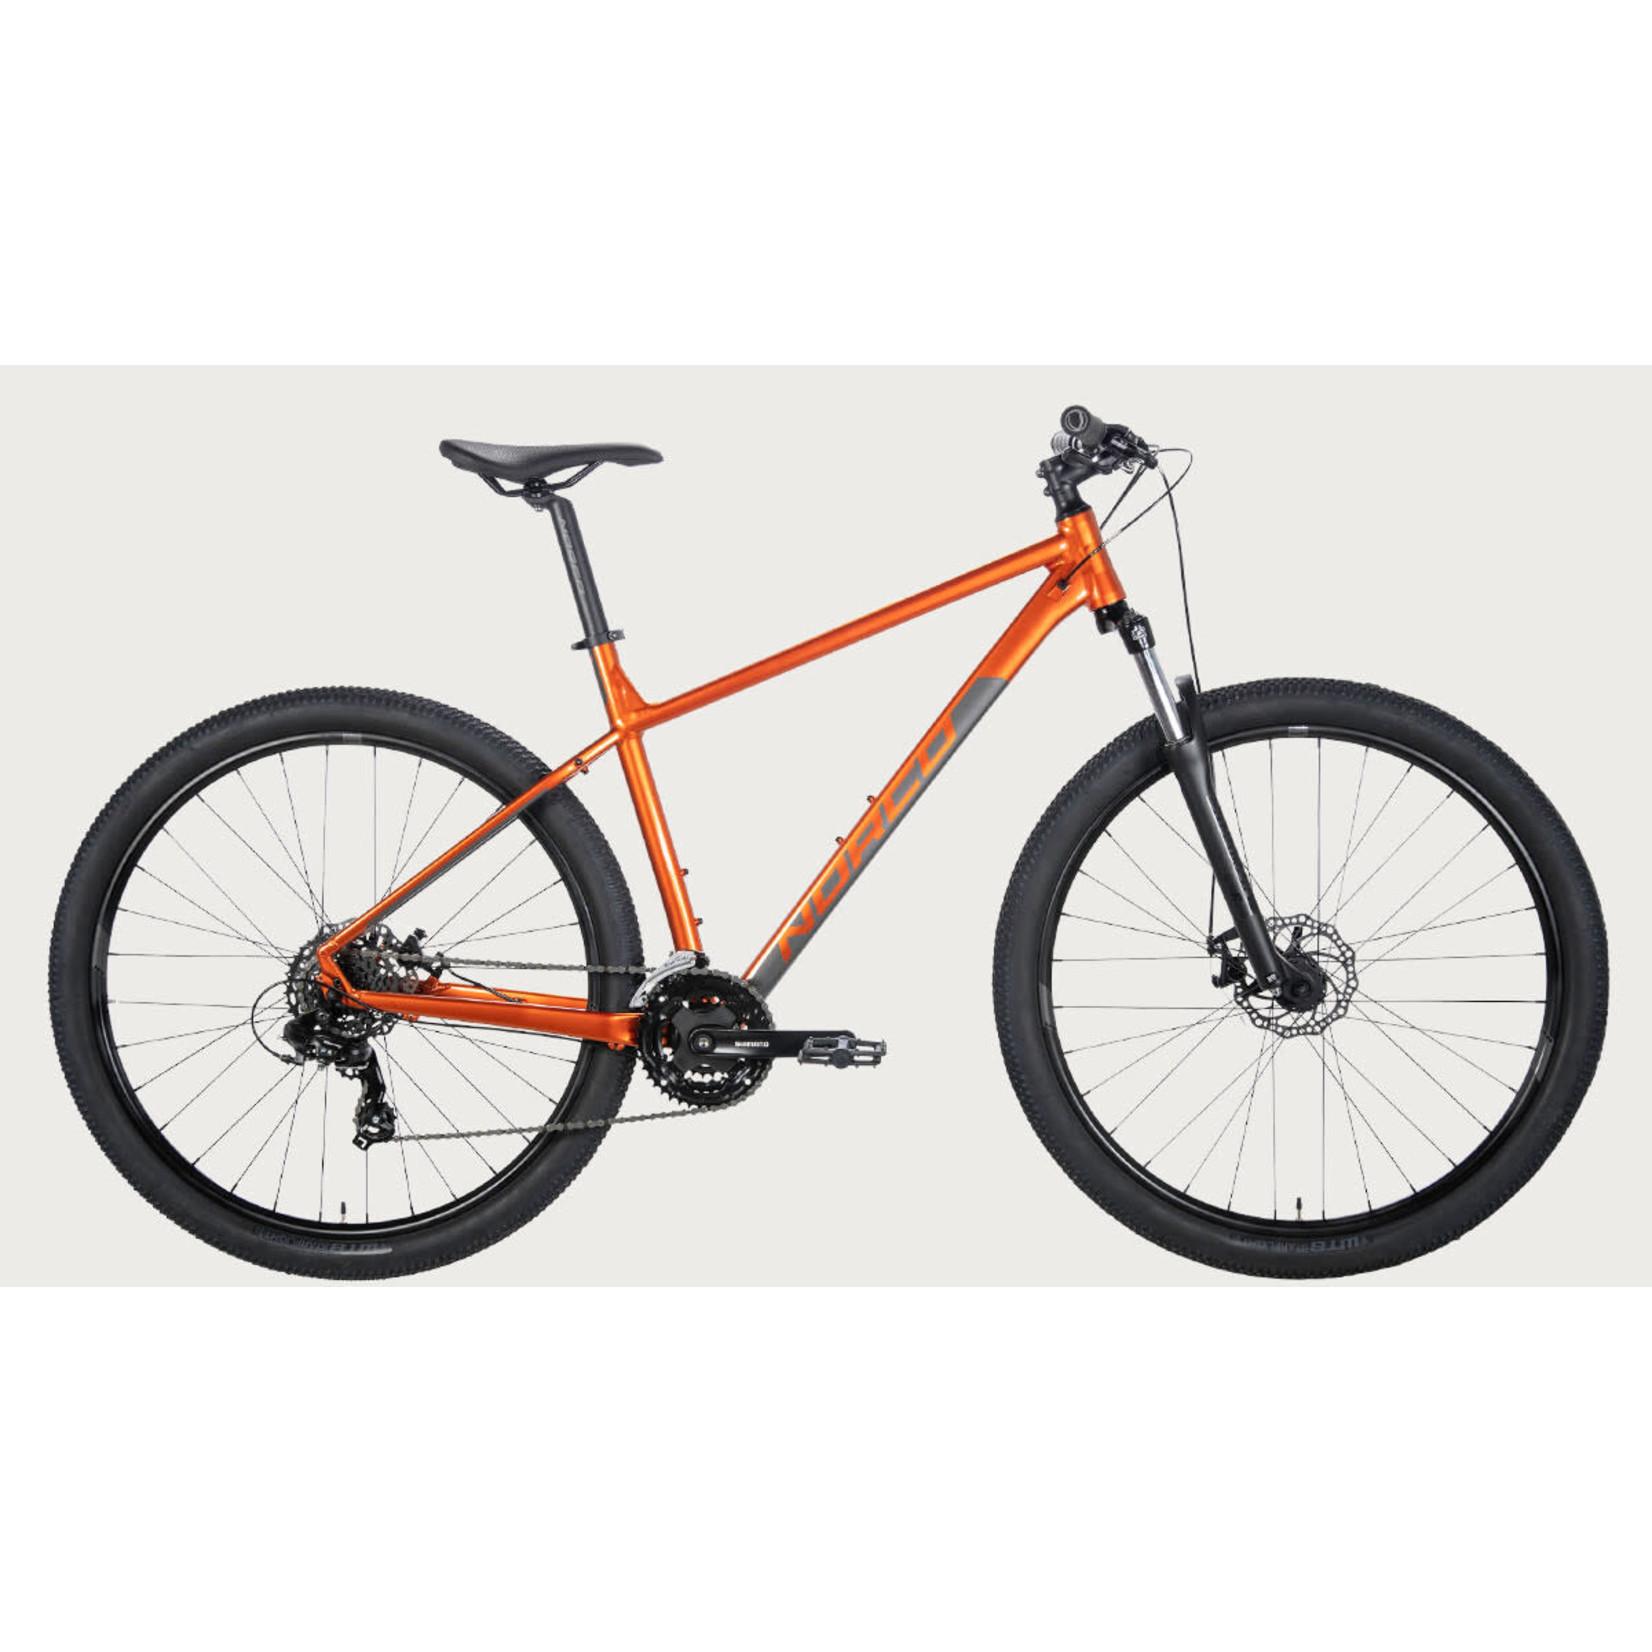 Norco Bike Norco Storm 5 Orange/Charcoal 27.5 M